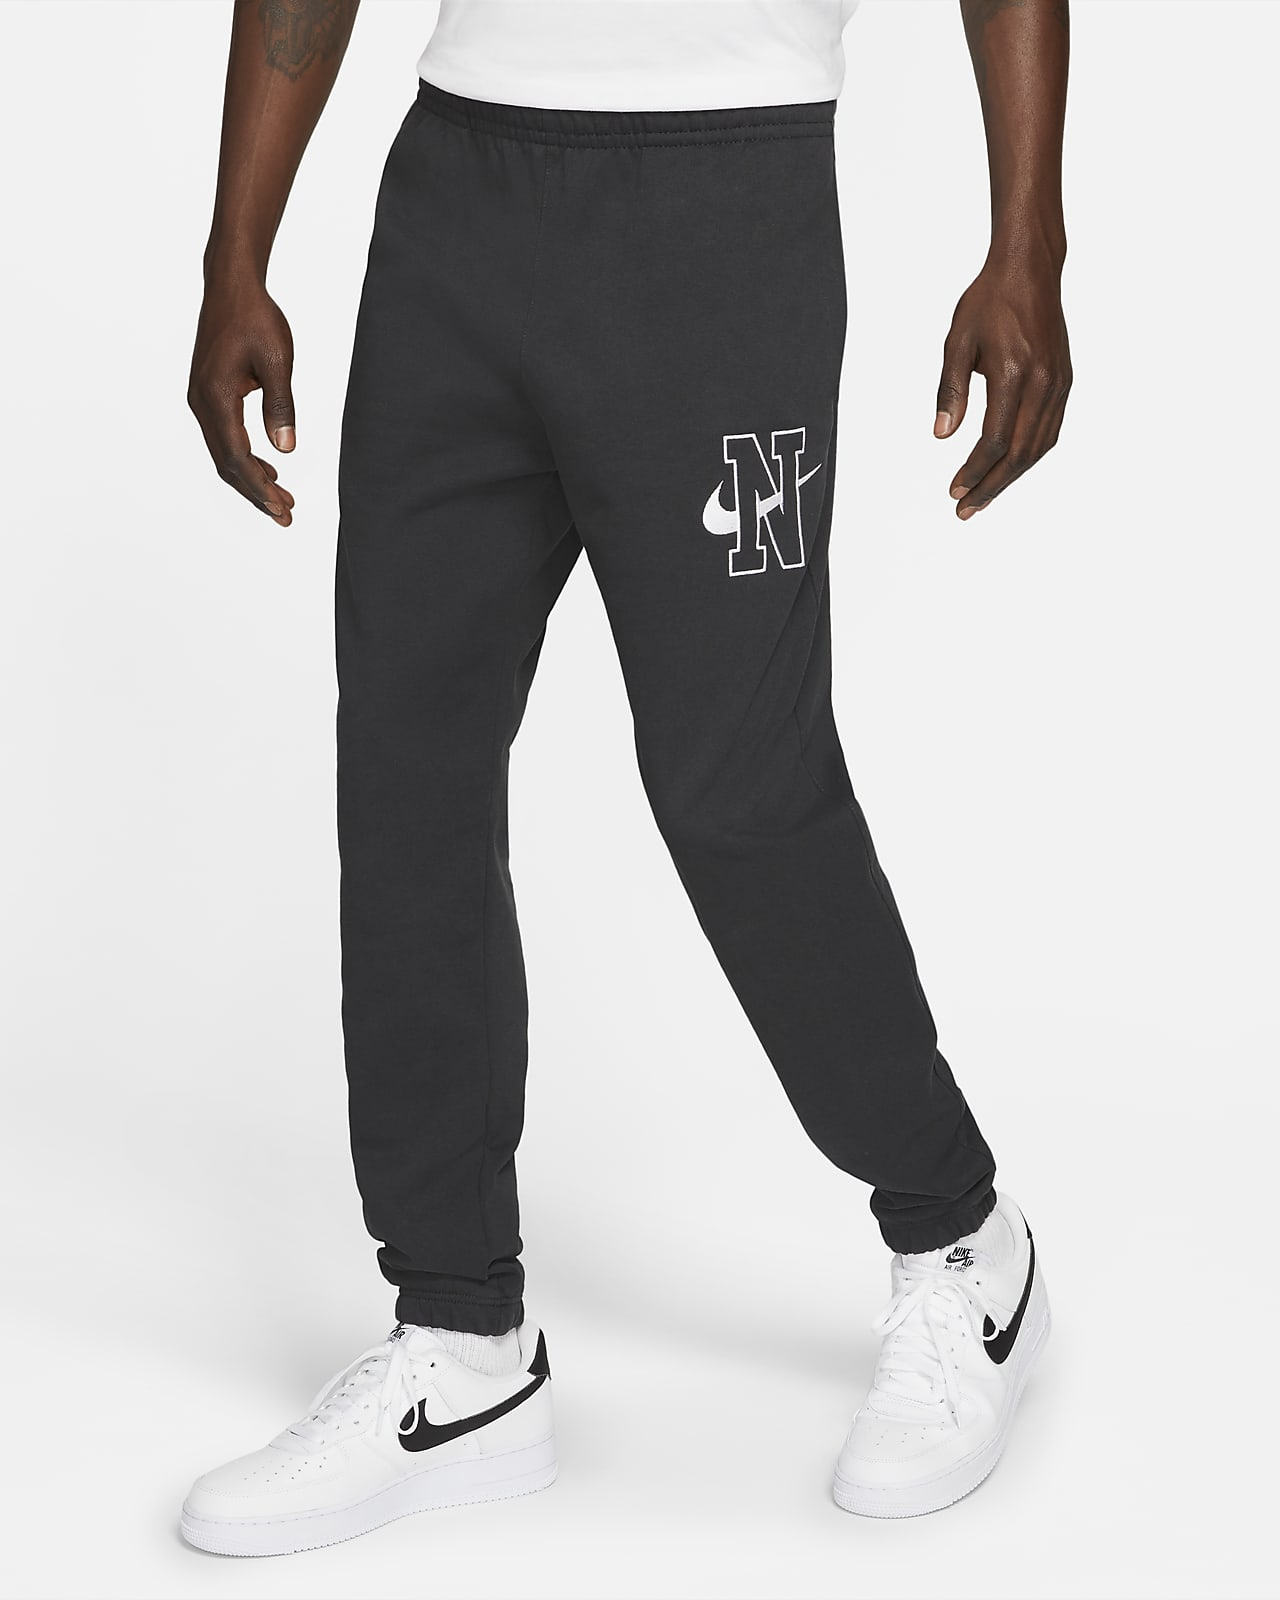 Pantalon en tissu Fleece Nike Sportswear Club pour Homme. Nike LU